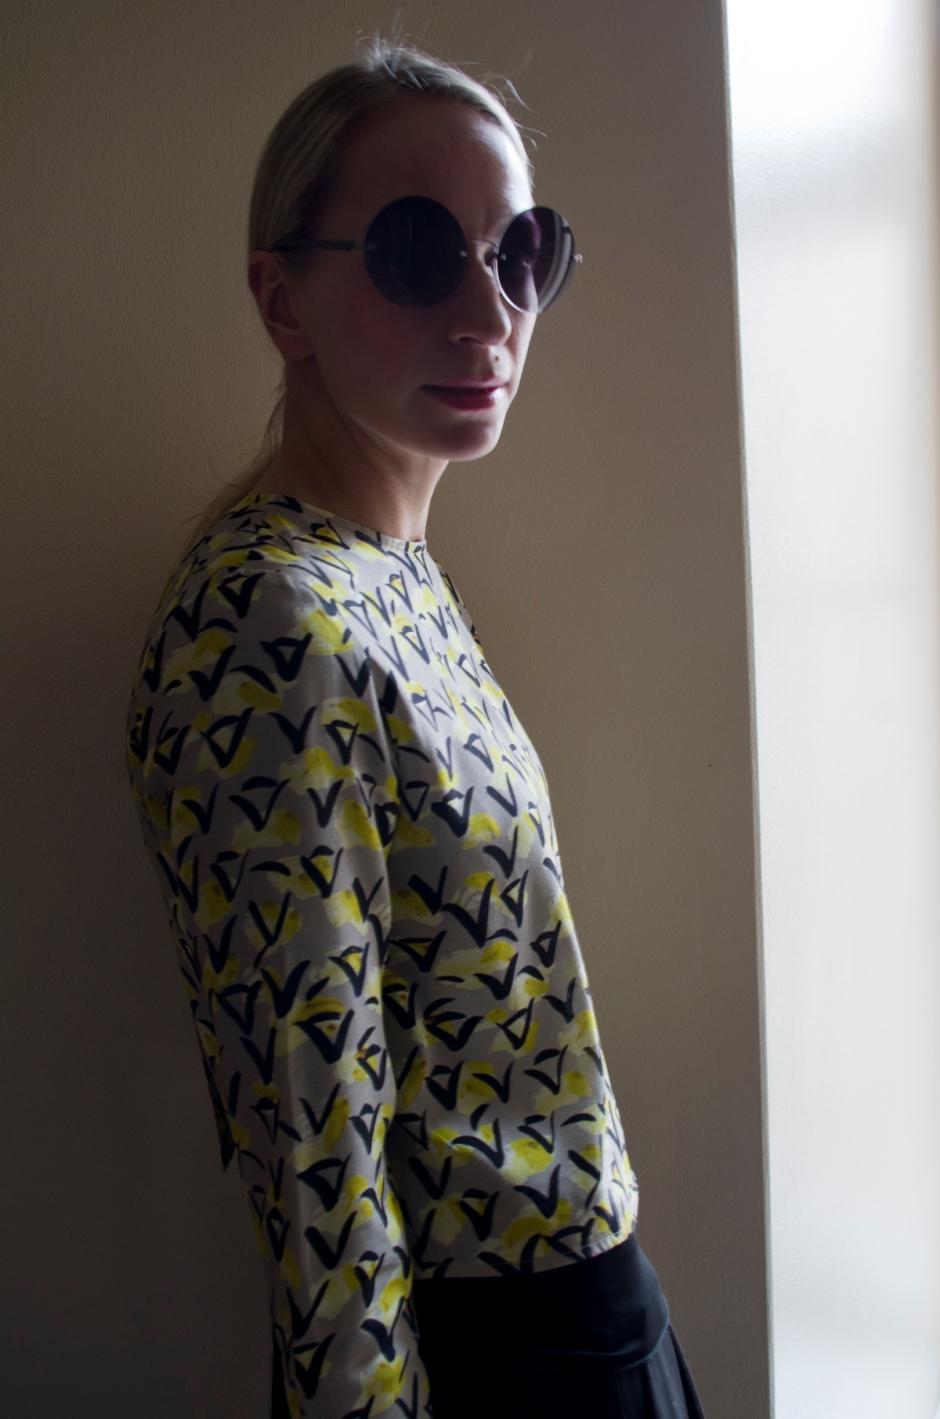 Samuji shirt and Selected Femme skirt from Stockmann. Oxydo sunglasses from Keops Helsinki   www.stillme.fi